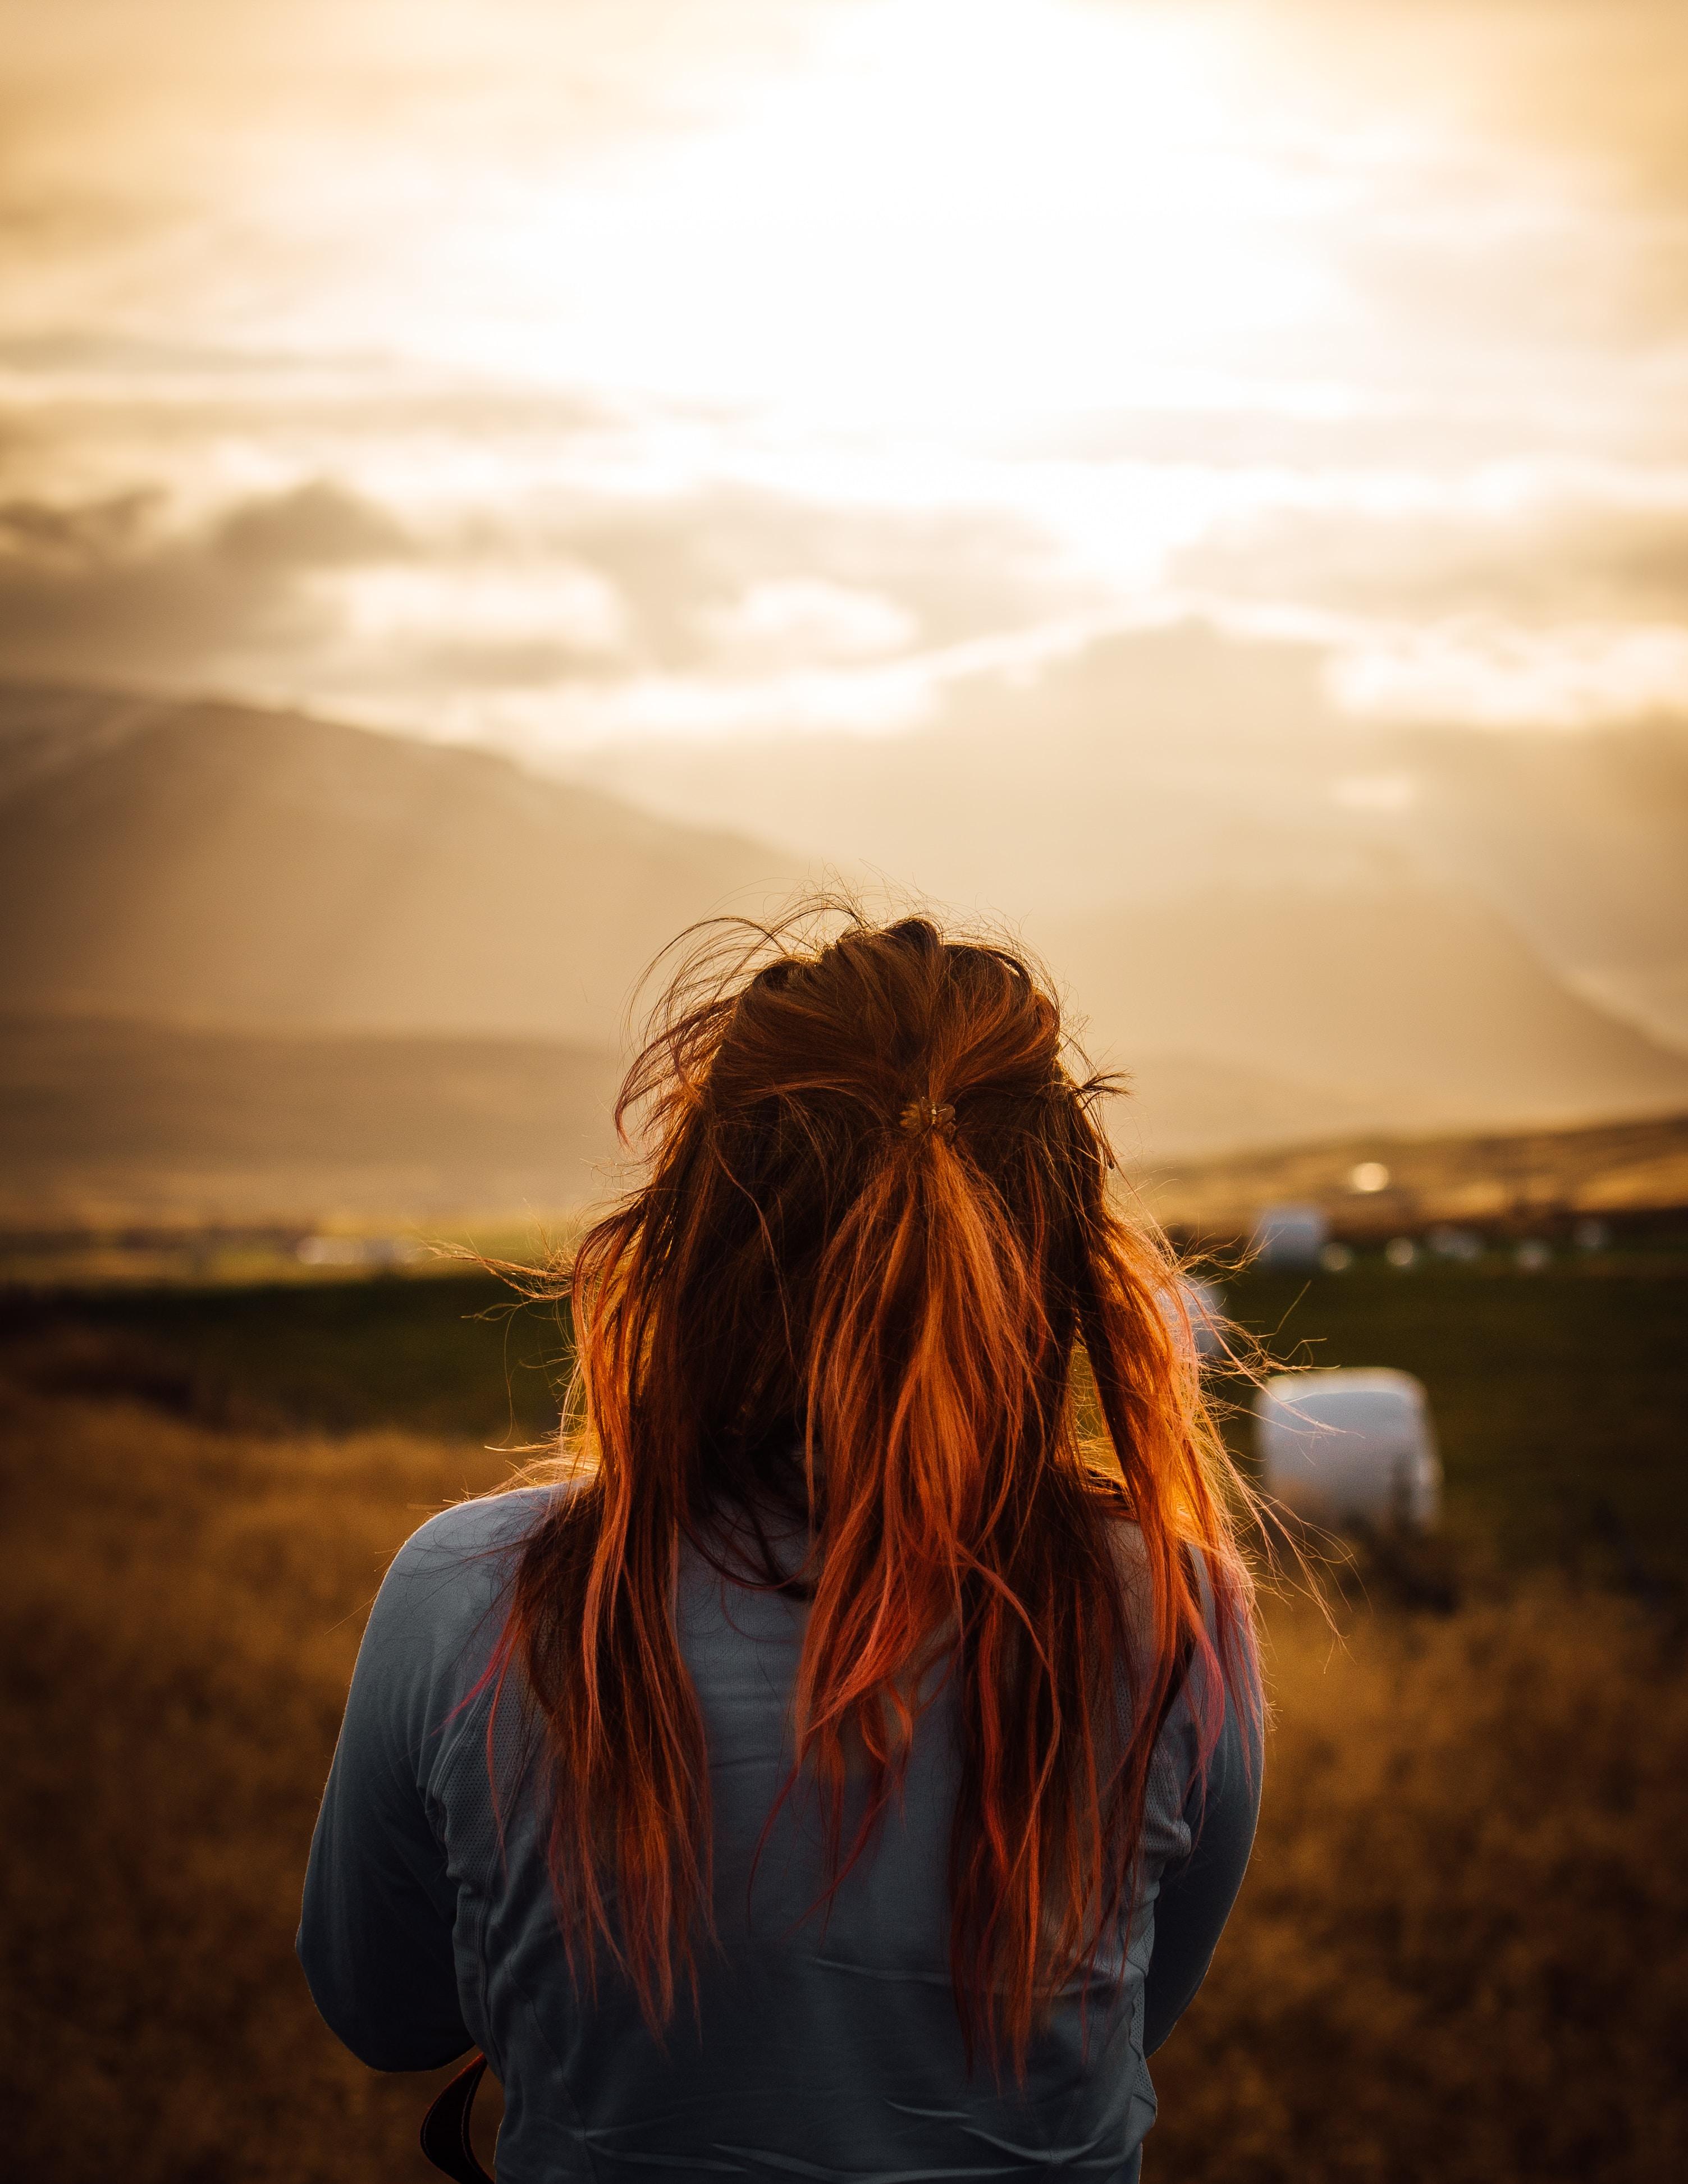 back view of woman facing grass fields